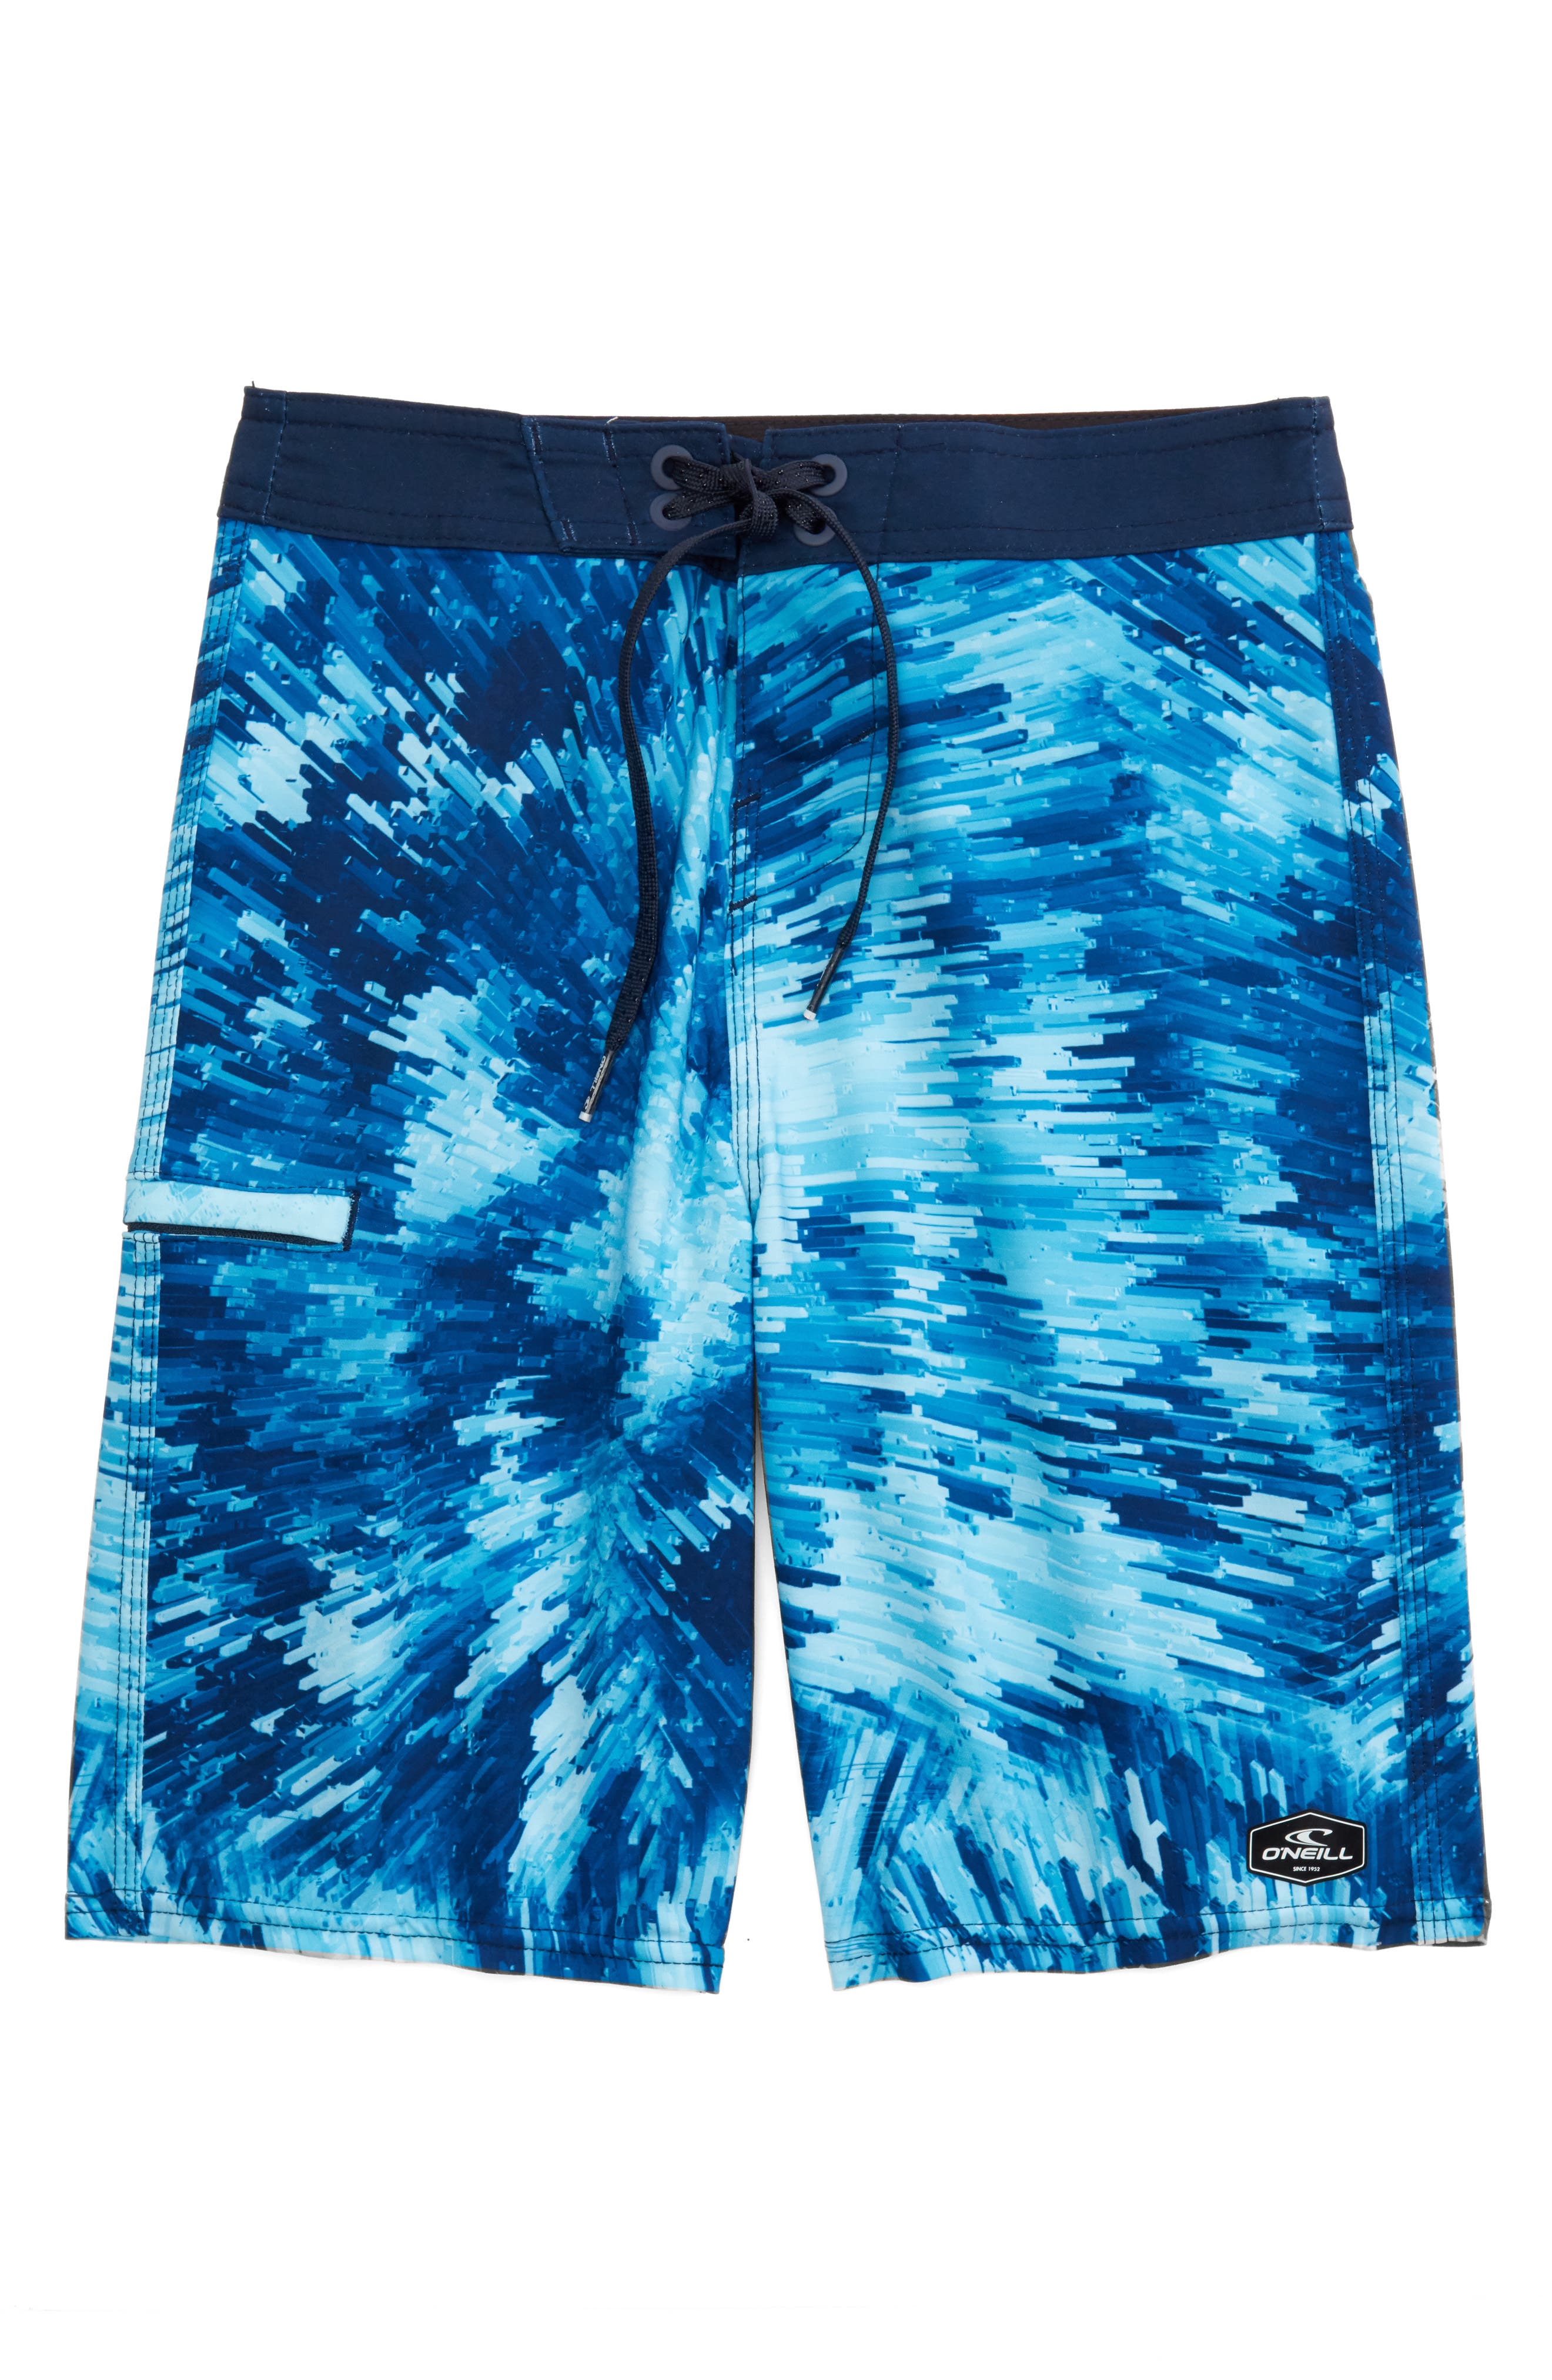 Hyperfreak Crystalize Board Shorts,                             Main thumbnail 1, color,                             Blue